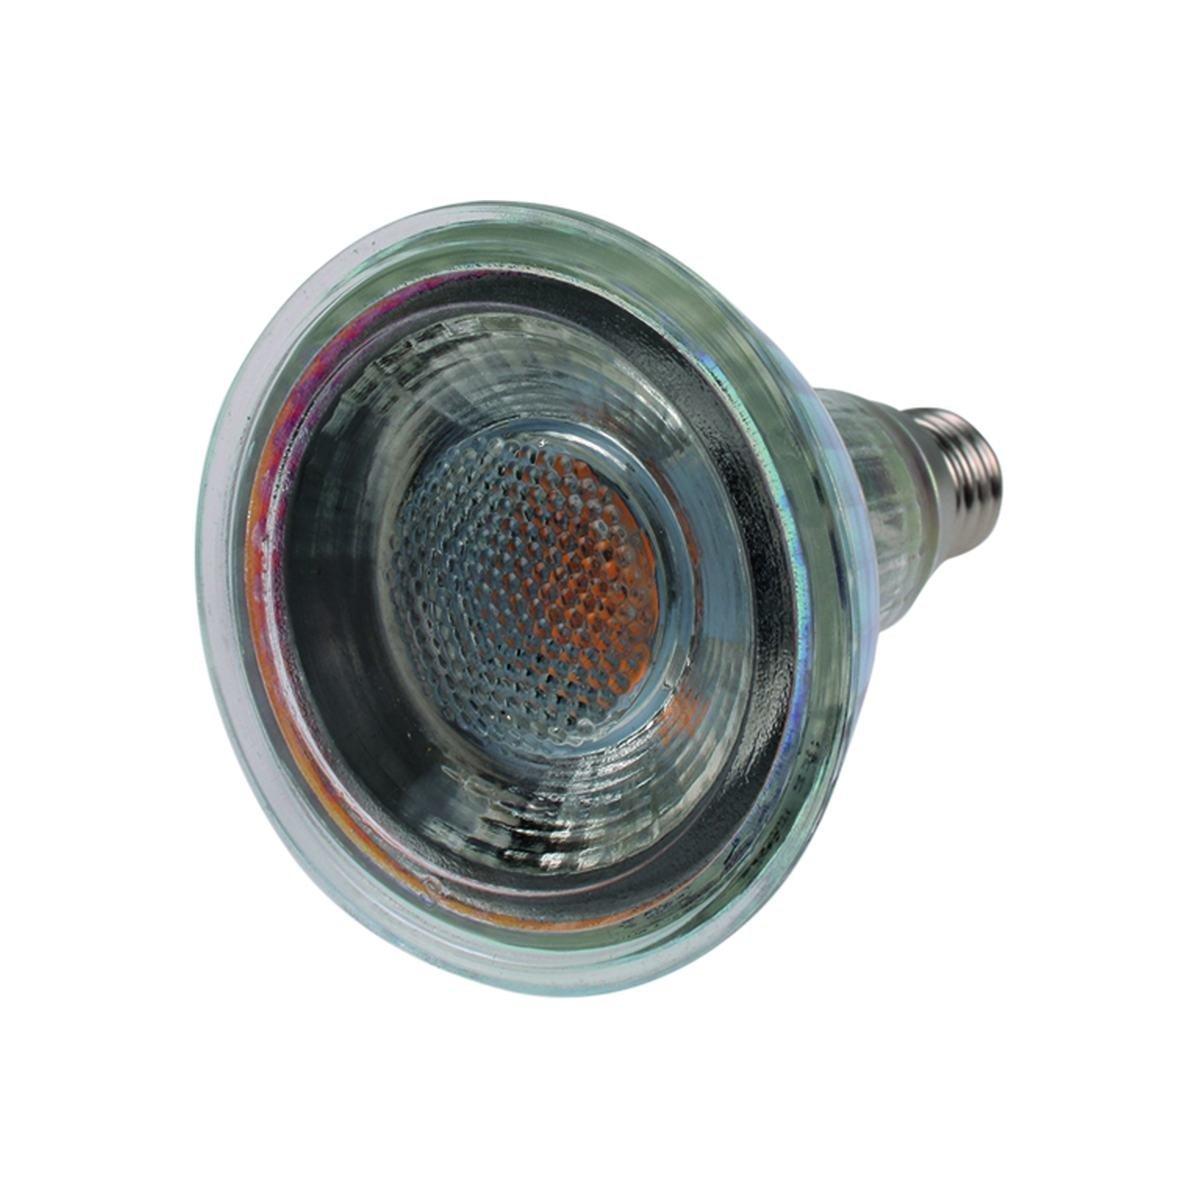 Halogenlampa 40W E14 Ø50 mm - Osram